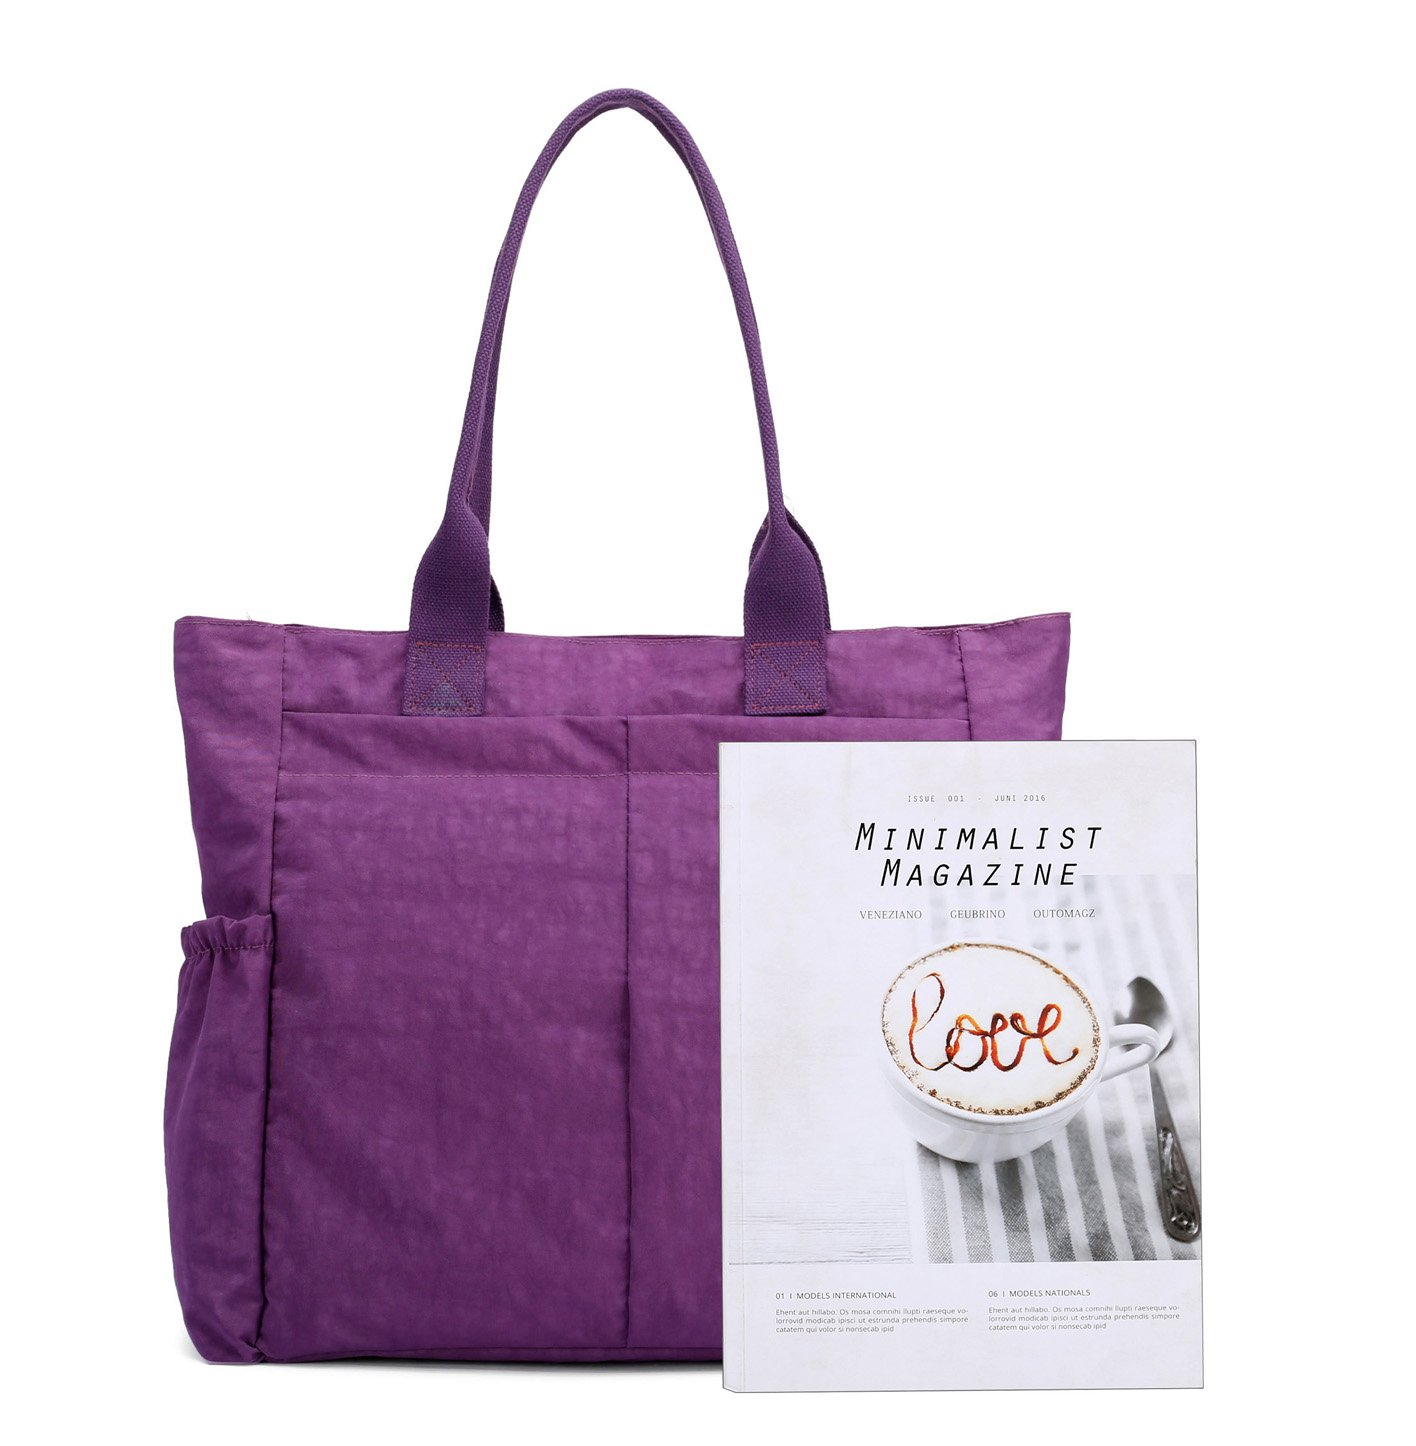 Black HB Nylon Water Resistant Multi Pockets Large Lightweight Tote Bag Shoulder Bag for Gym Hiking Picnic Travel Beach Waterproof Tote Bags